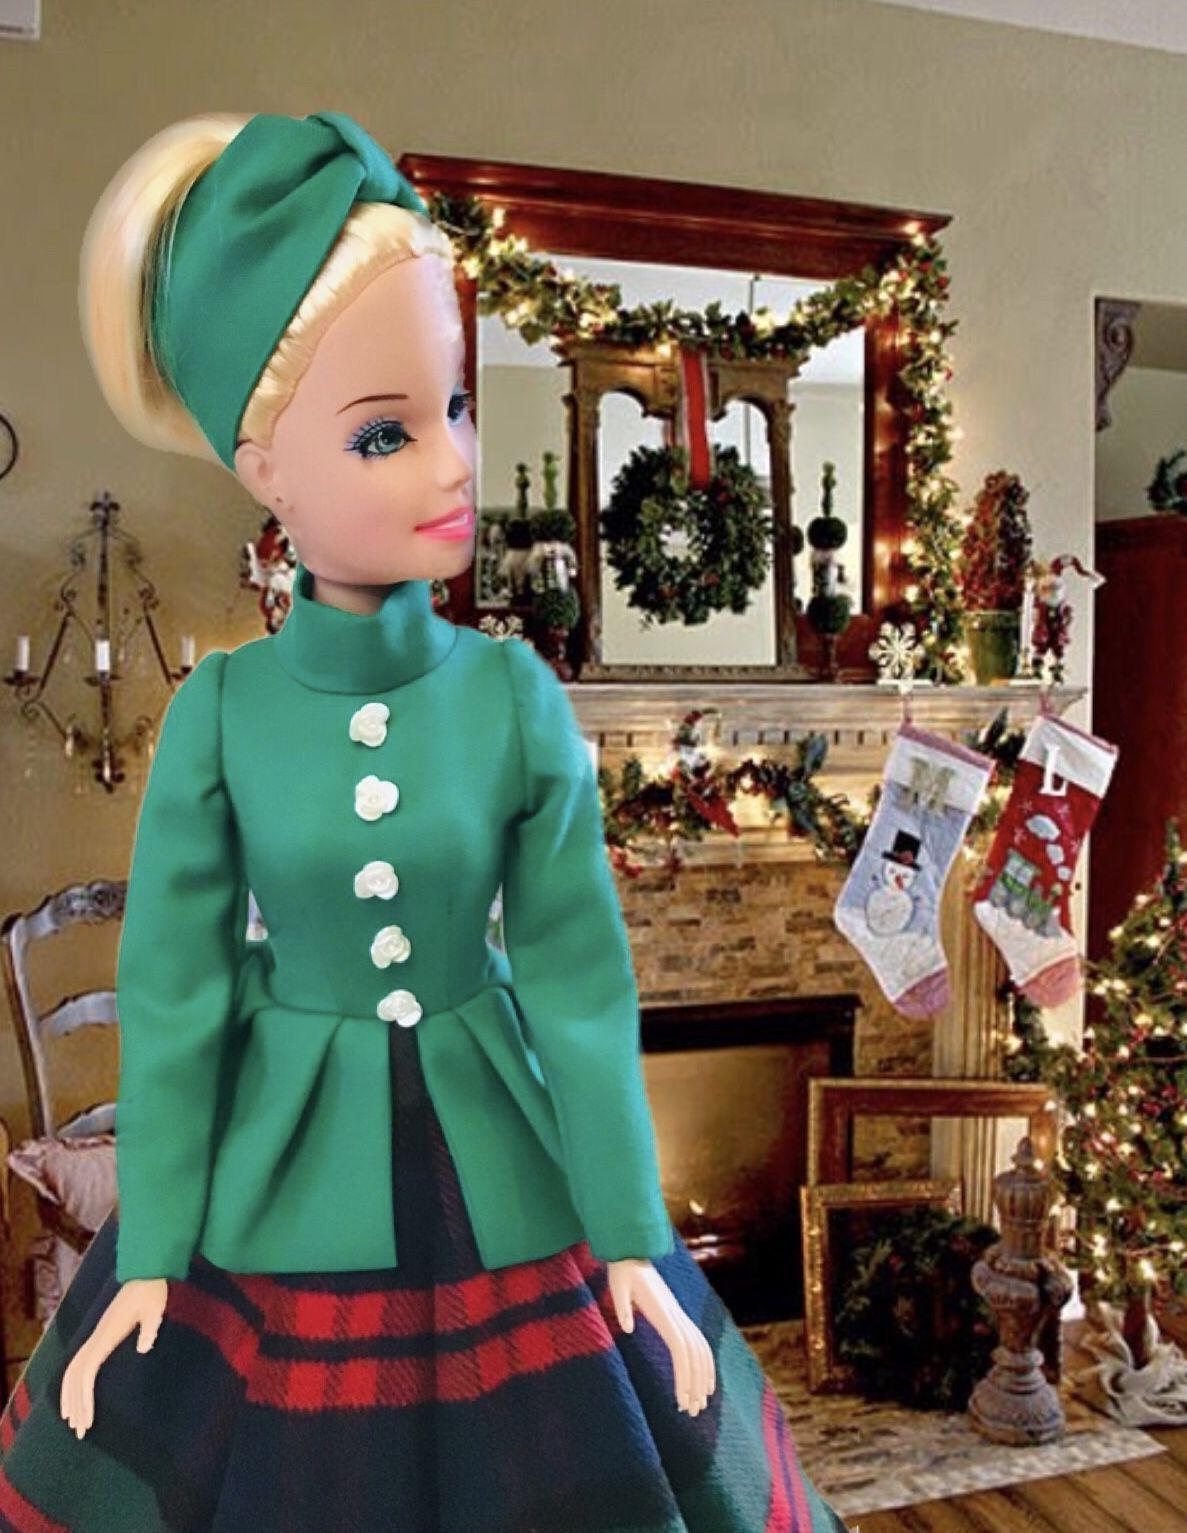 AldrimaStudio on Etsy #dollvictoriandressstyles #doll#barbie#christmas#holiday#dress#sewn#style#design#handmade#gift#embelished#fashion #hat#beautifull#winter#classic#victorian# #dollvictoriandressstyles AldrimaStudio on Etsy #dollvictoriandressstyles #doll#barbie#christmas#holiday#dress#sewn#style#design#handmade#gift#embelished#fashion #hat#beautifull#winter#classic#victorian# #dollvictoriandressstyles AldrimaStudio on Etsy #dollvictoriandressstyles #doll#barbie#christmas#holiday#dress#sewn#st